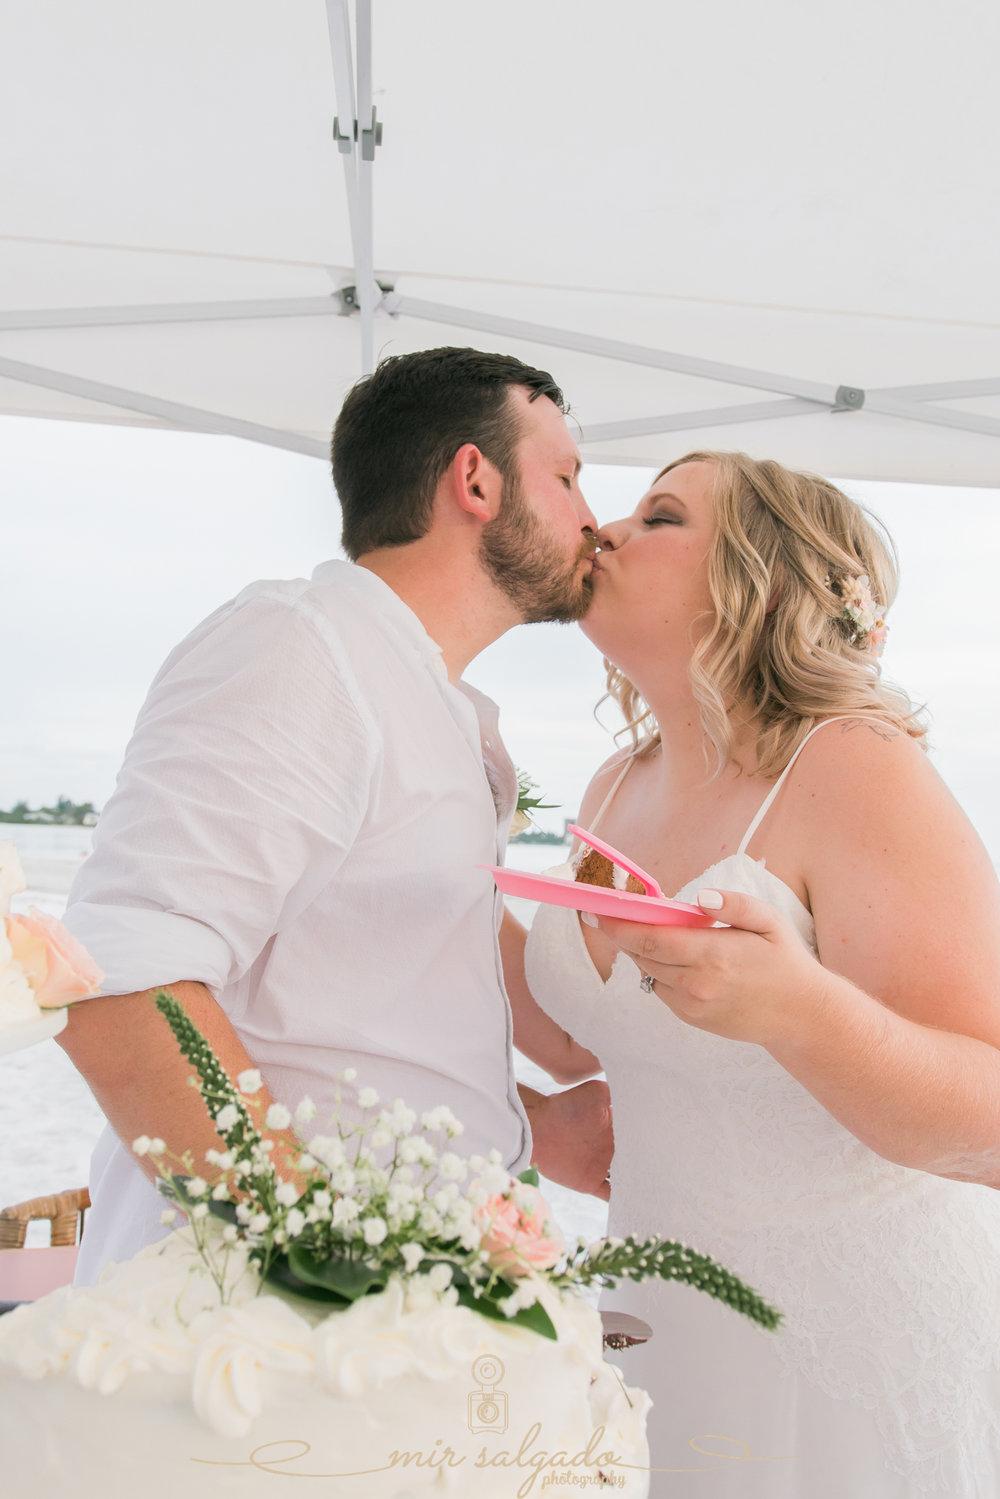 Tide-the-knot-beach-weddings, beach-wedding-photographer, St.Pete-photographer